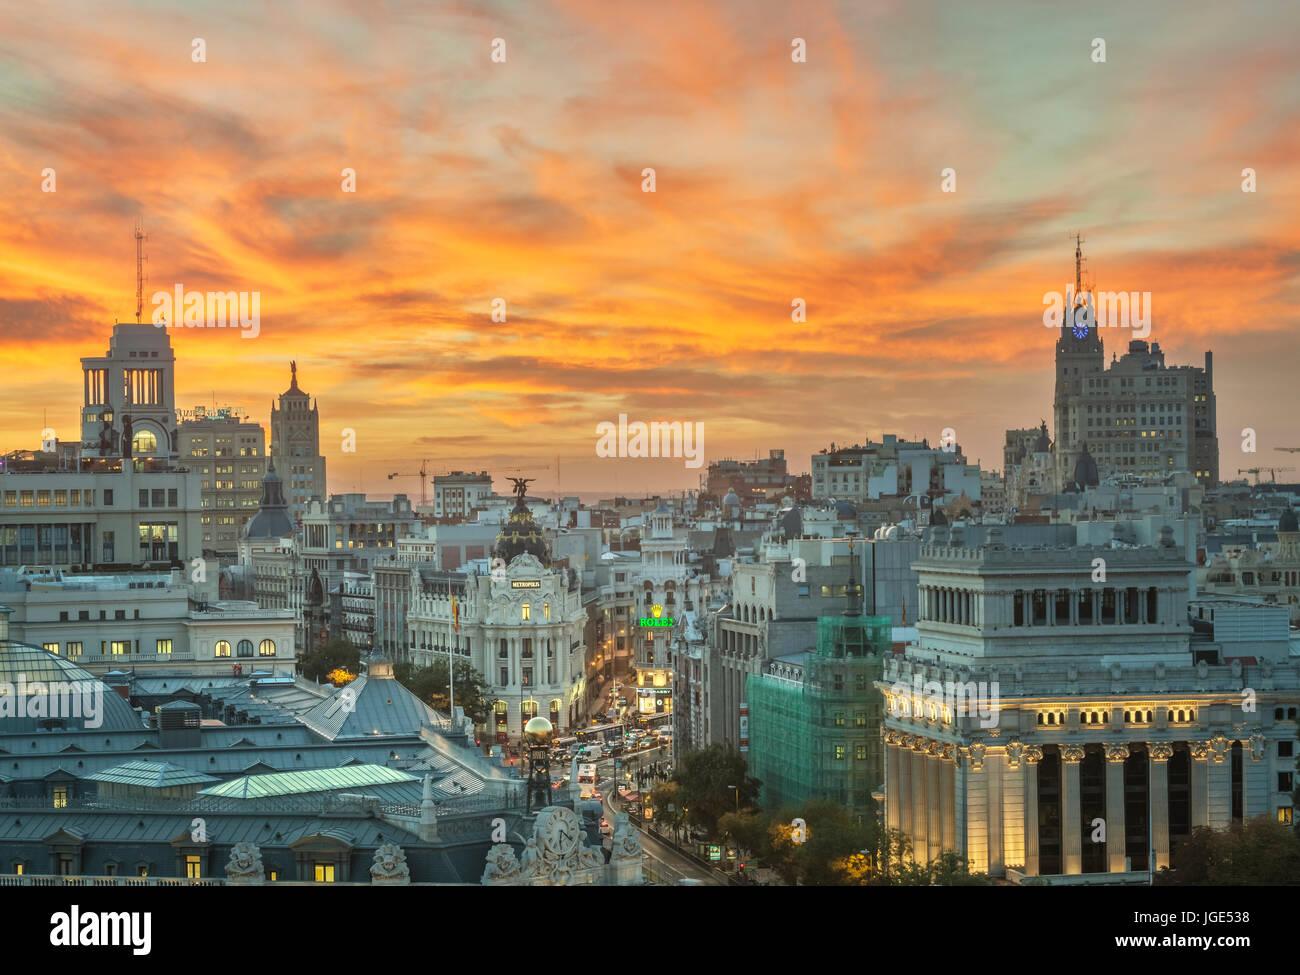 Madrid city center skyline. Madrid, Spain. - Stock Image